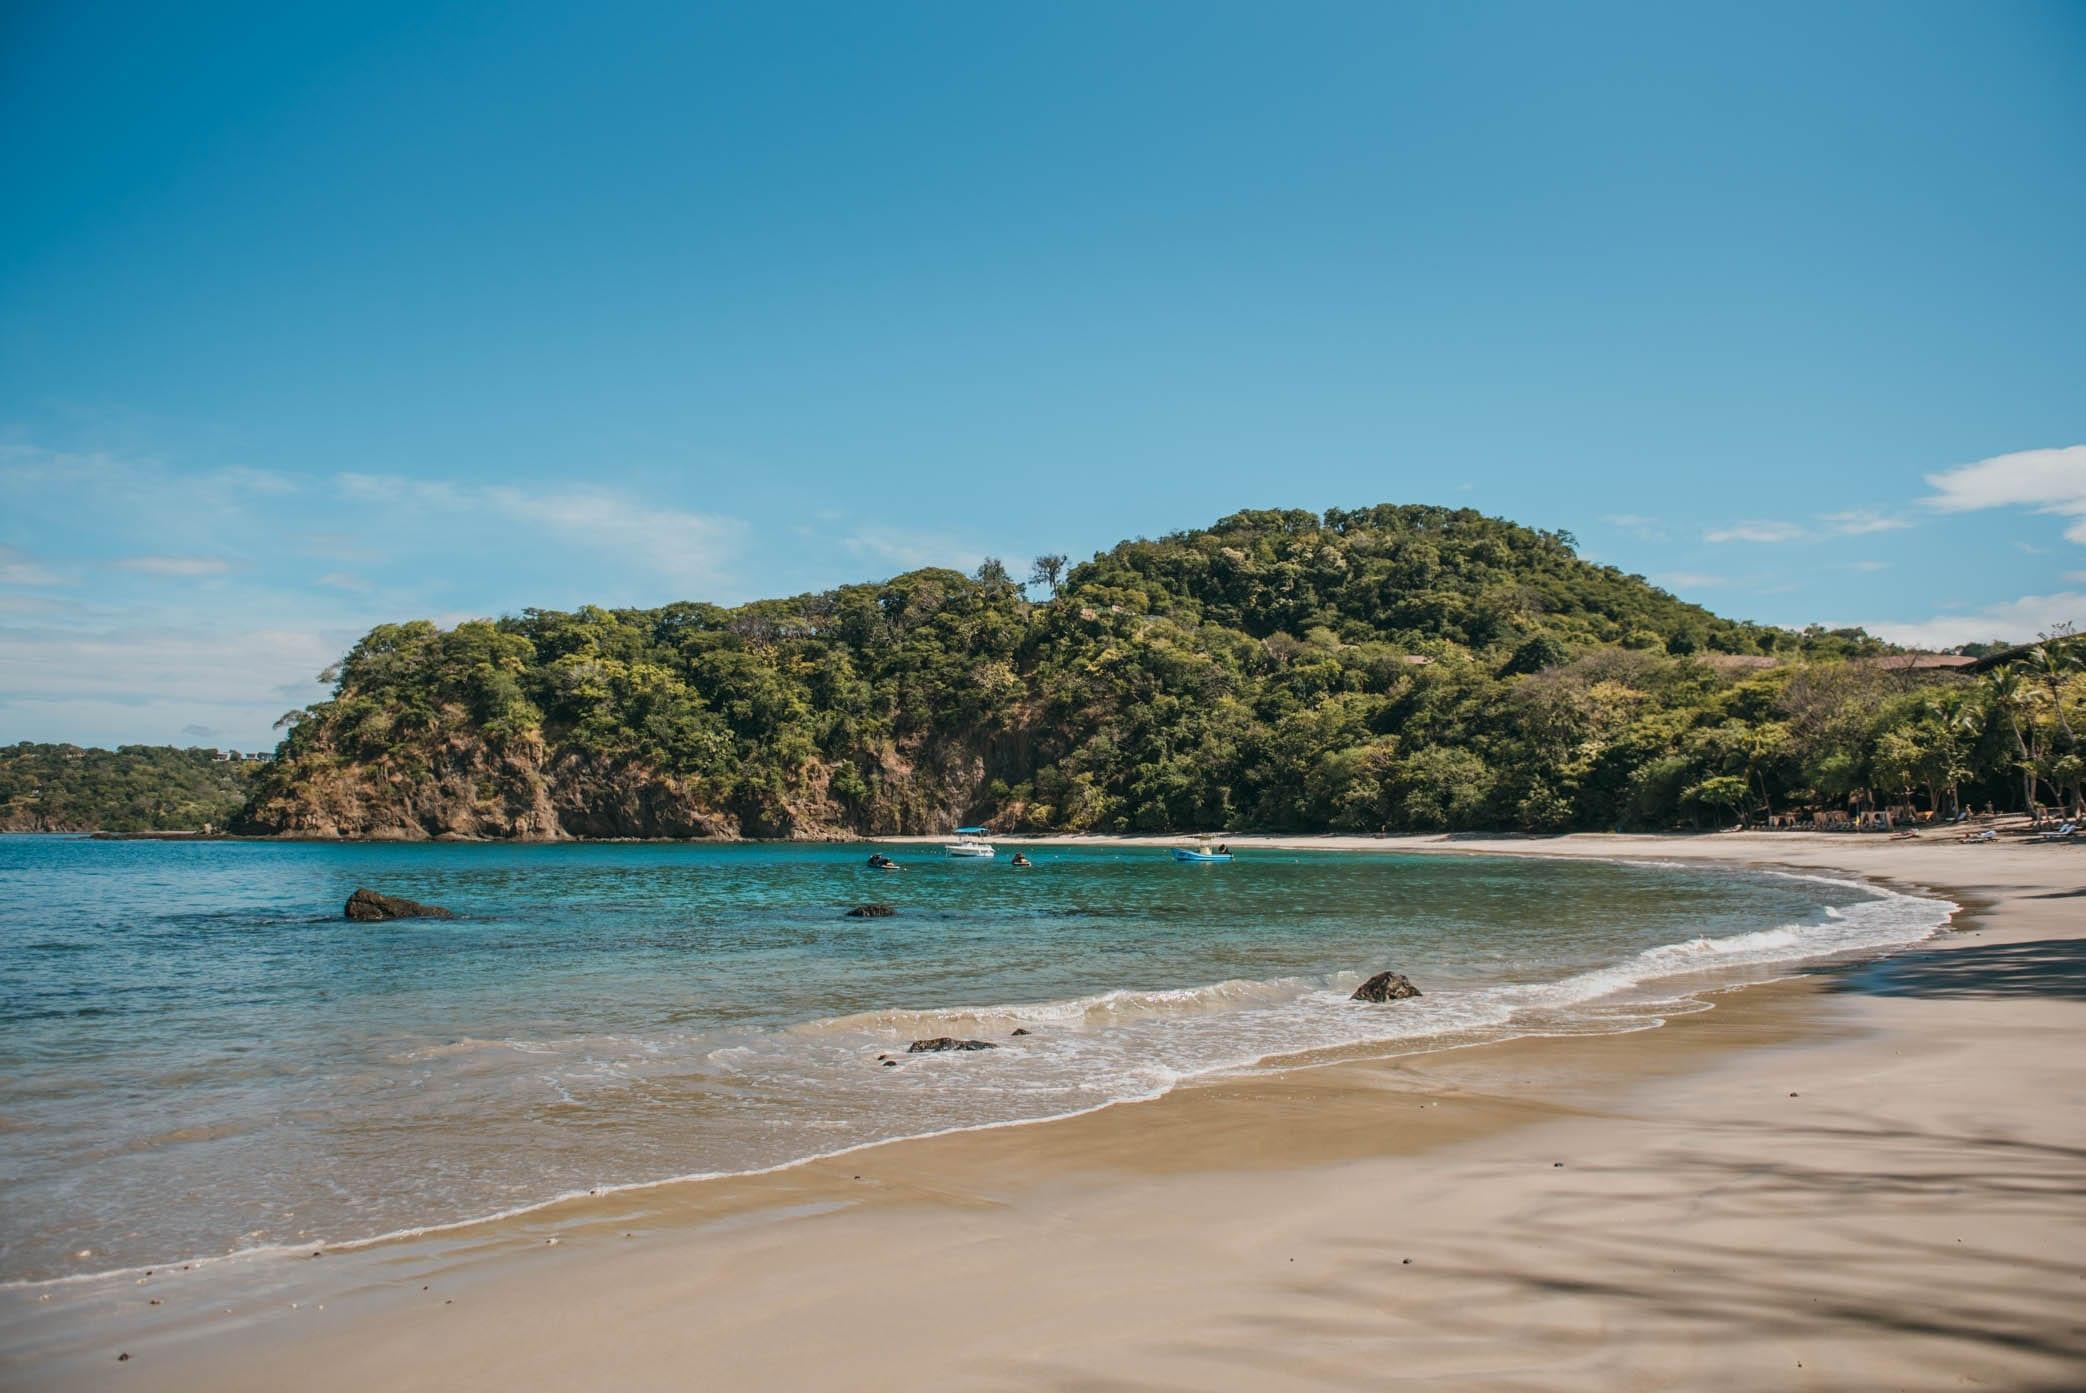 Beaches at Four Seasons Resort Costa Rica